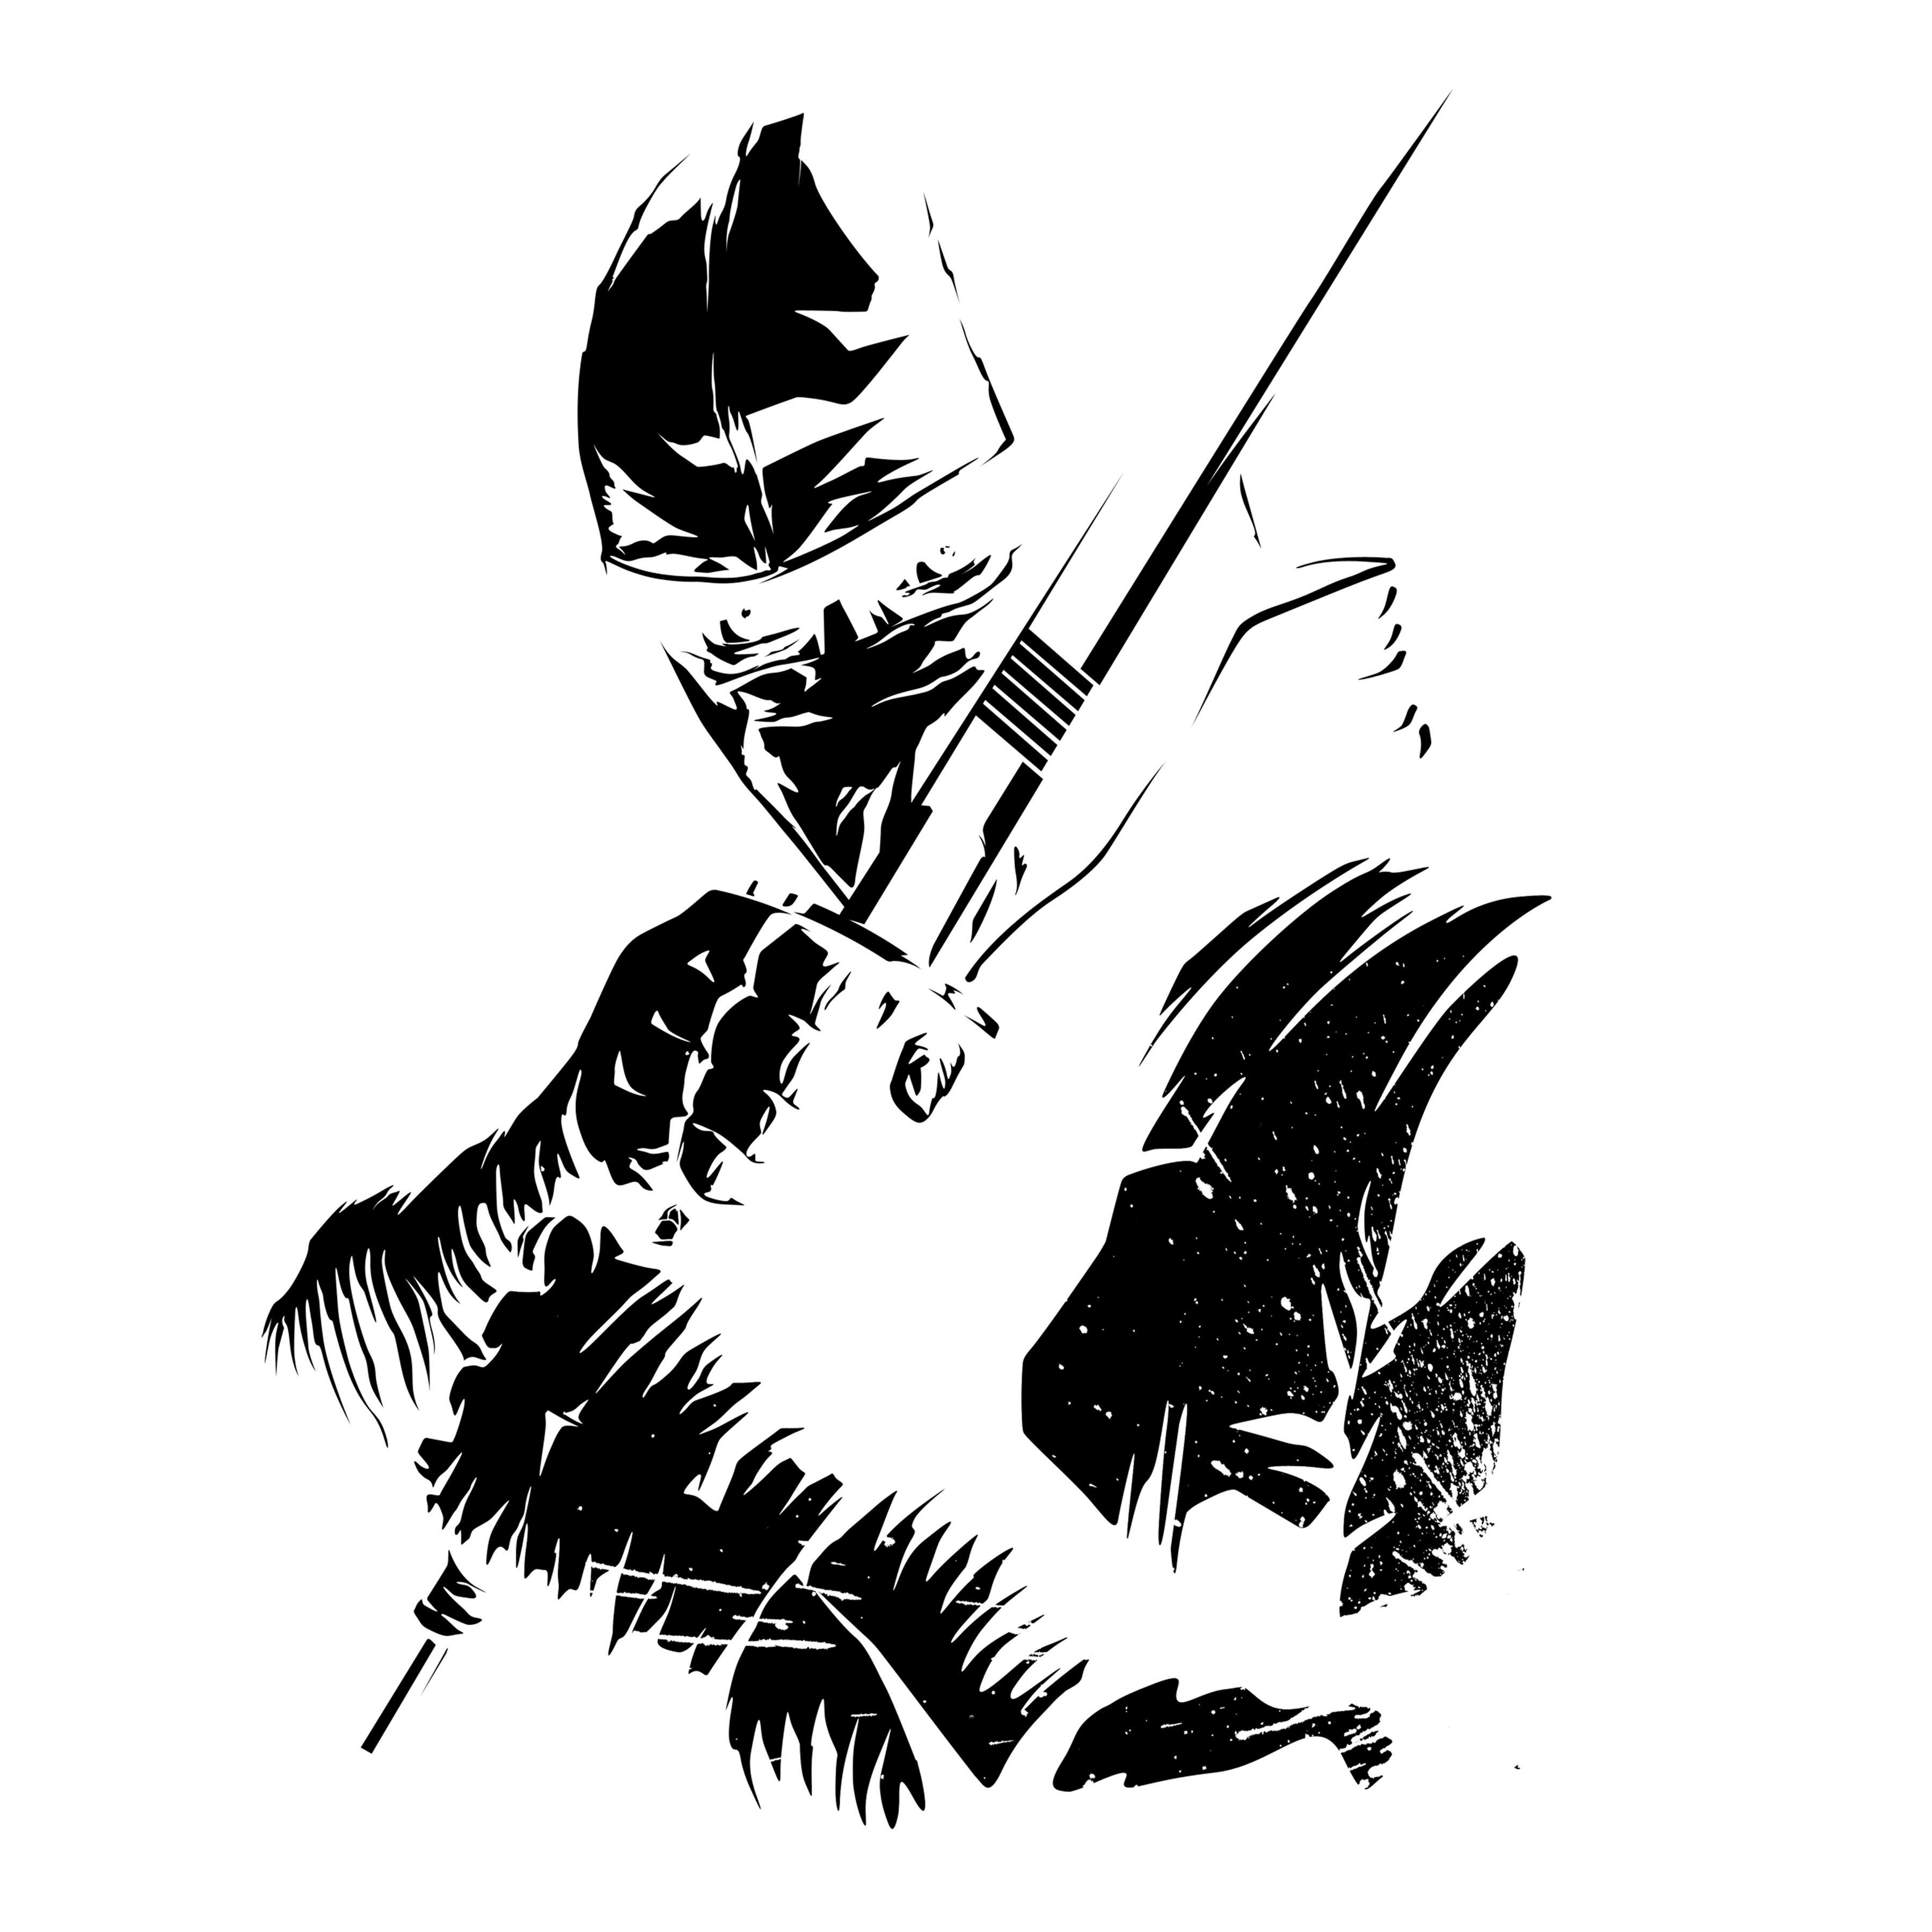 Gi joe the movie clipart picture freeuse download First Look At GI Joe 2 Movie Ninjas - HissTank.com picture freeuse download